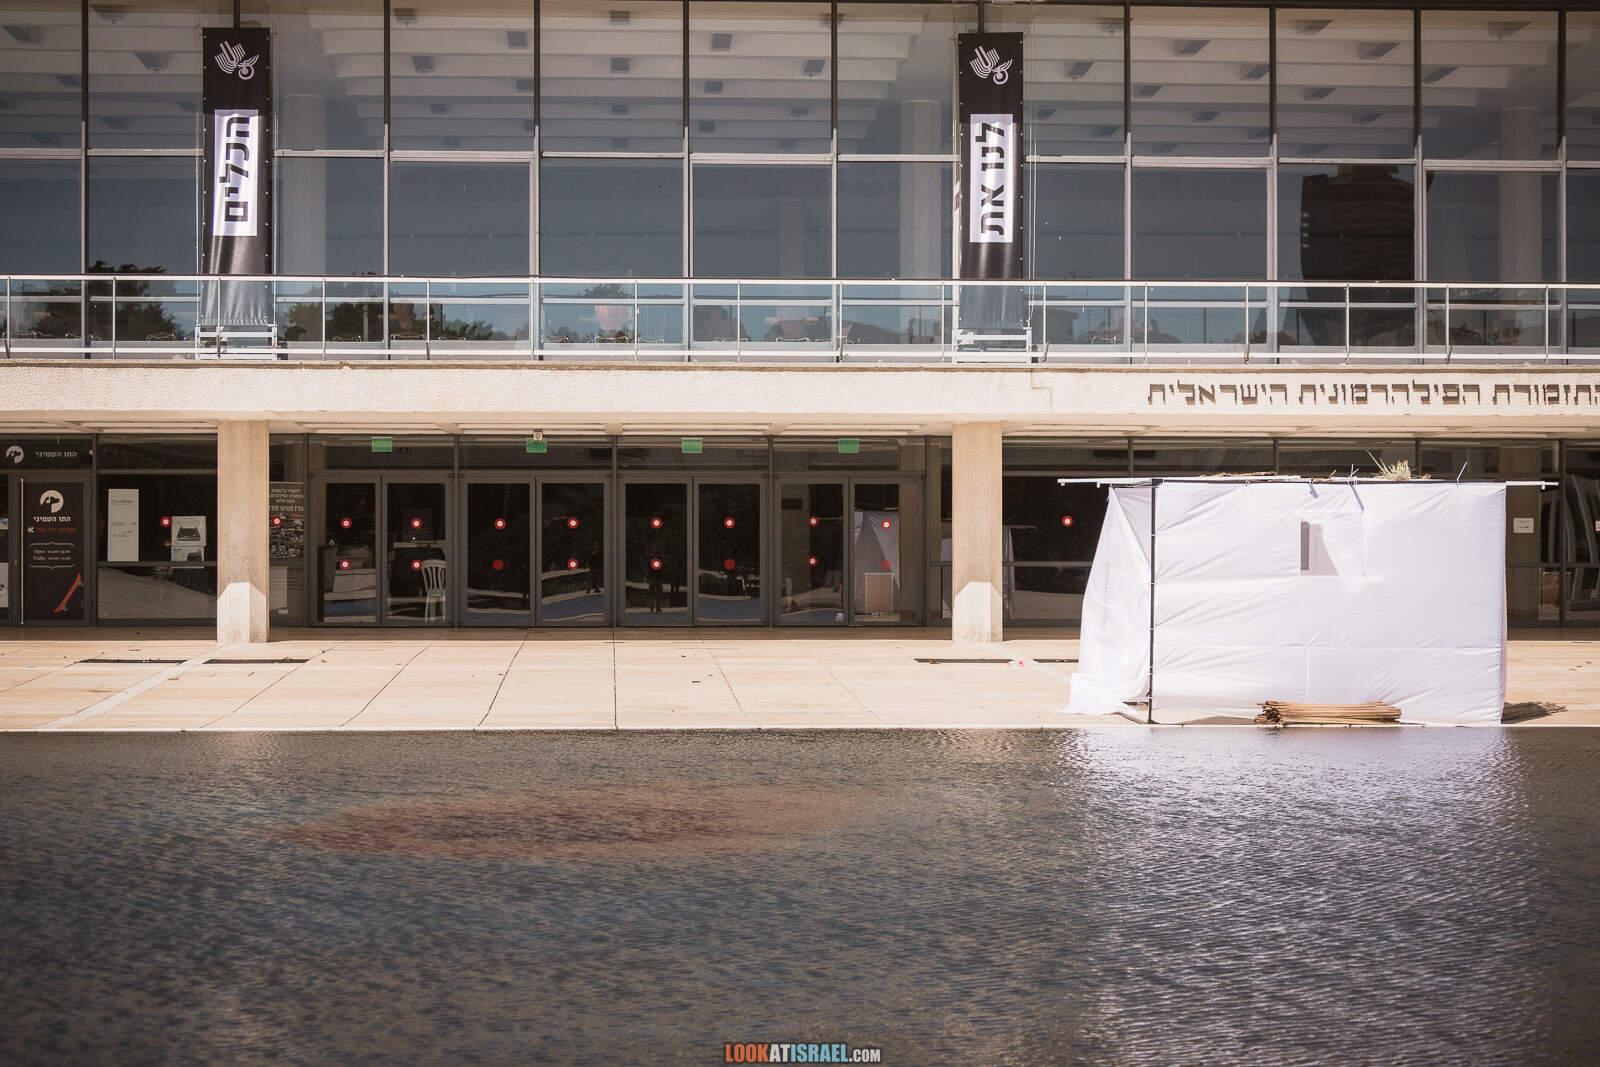 Тель-Авив, бульвар Ротшильд и театр Габими во время карантина | Lockdown on beaches of Tel Aviv | LookAtIsrael.com - Фото путешествия по Израилю